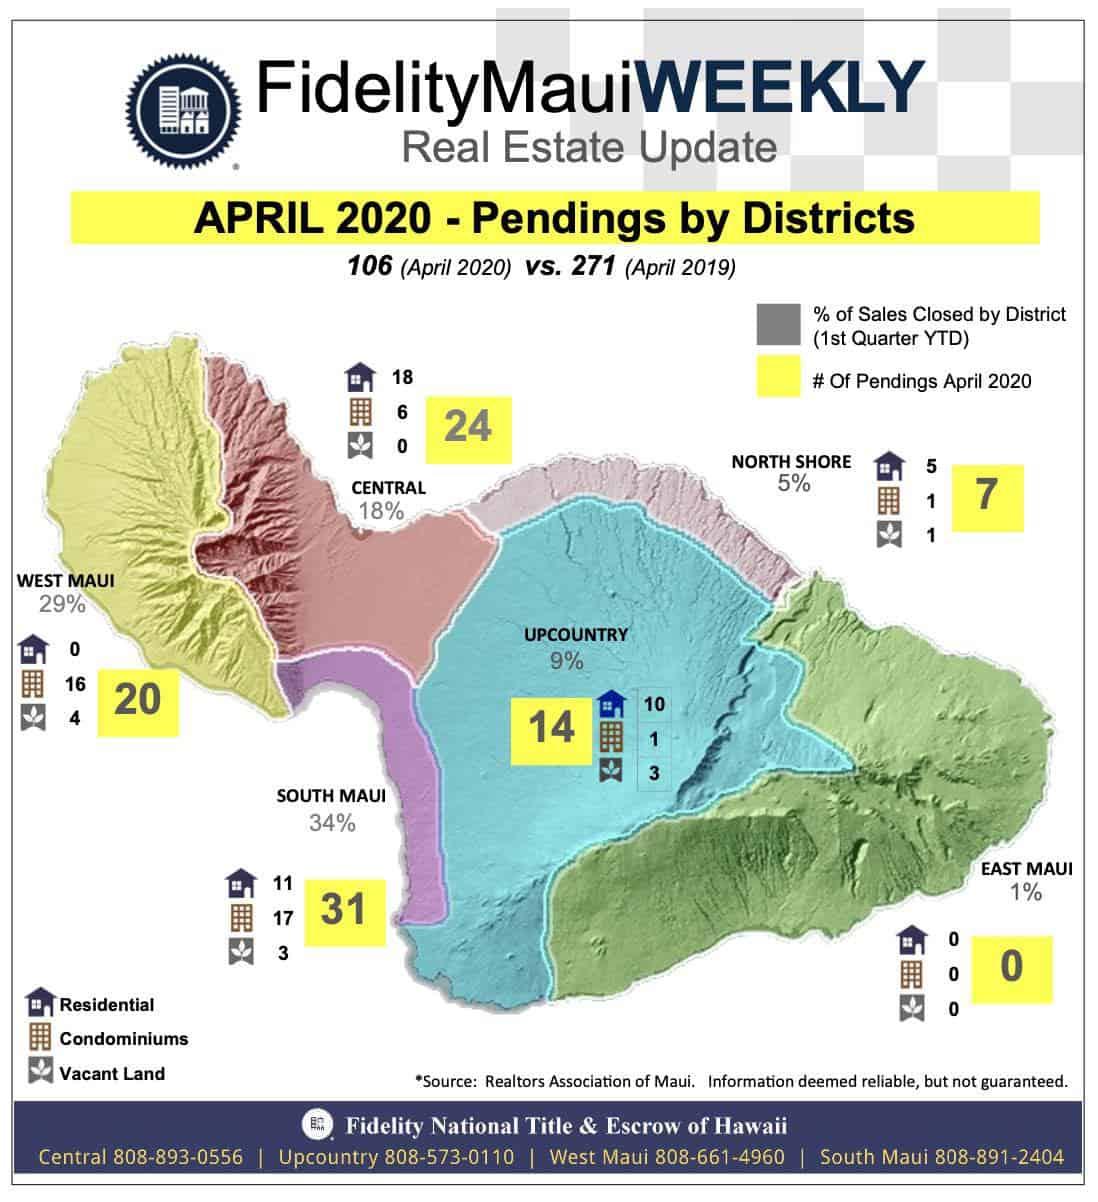 Maui April 2020 pending map